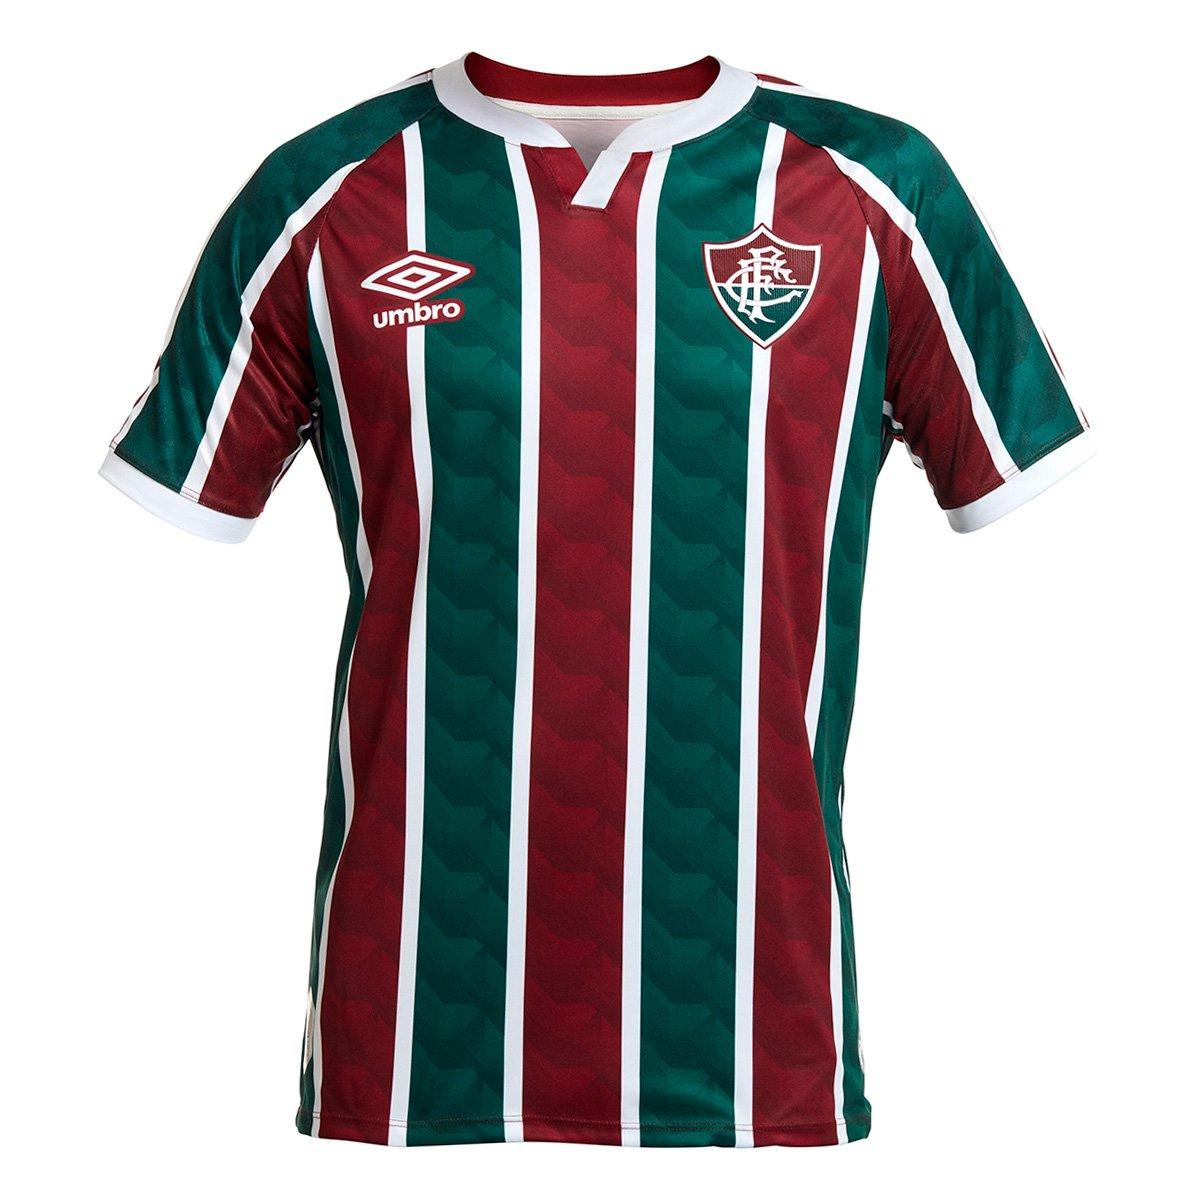 https://static.netshoes.com.br/produtos/camisa-fluminense-i-2021-sn-torcedor-umbro-masculina/98/D21-5955-098/D21-5955-098_zoom1.jpg?ts=1589538032&